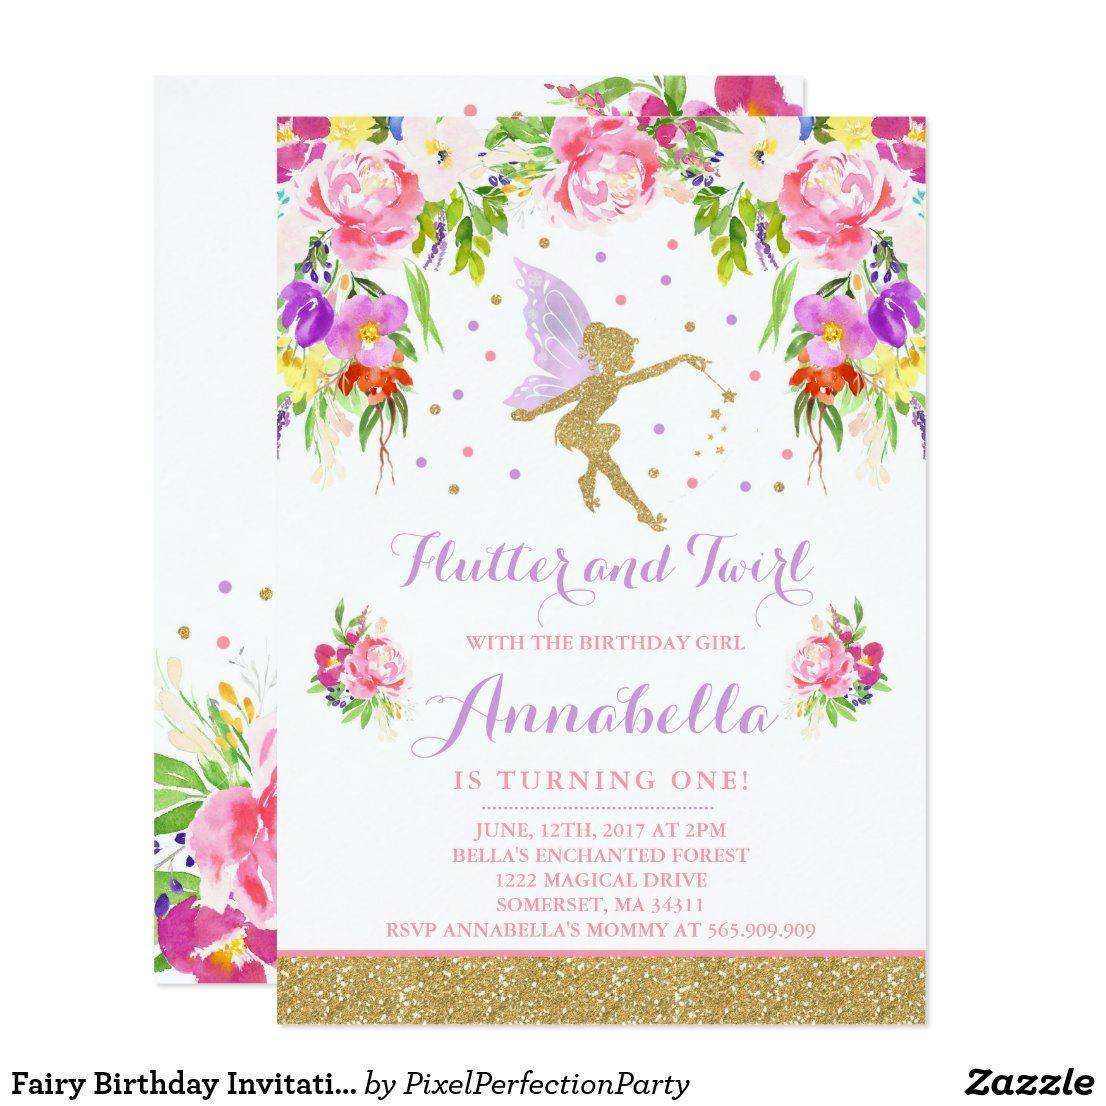 Fairy Birthday Invitation Whimsical Magical Party Zazzle